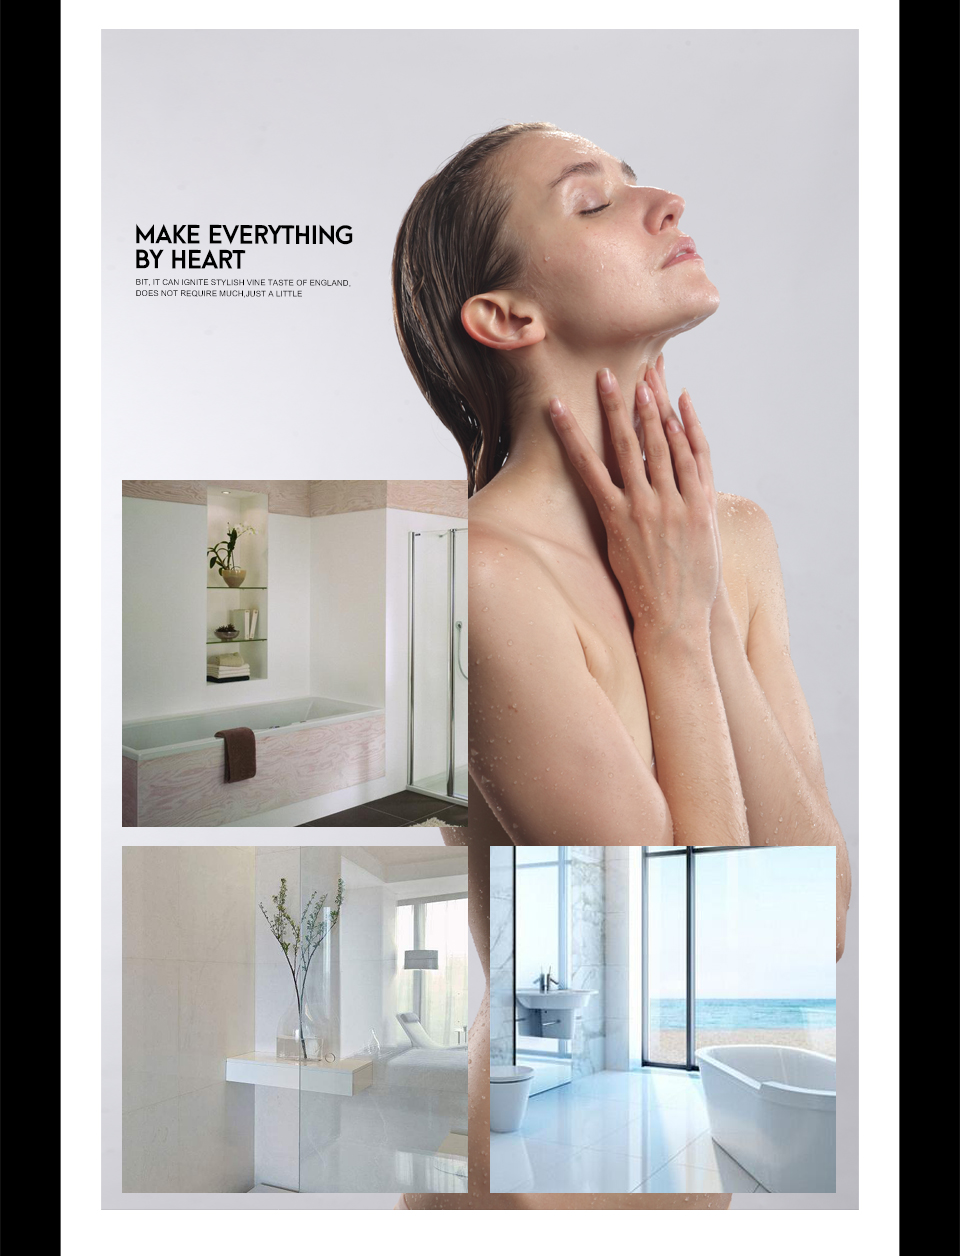 HTB1sUtyG25TBuNjSspcq6znGFXaB FRAP Chrome Brass Bidets Bathroom Toilet Sprayer Muslim Shower Bidet Tap Hygienic Shower Wall Mount Shattafs Faucets F7506